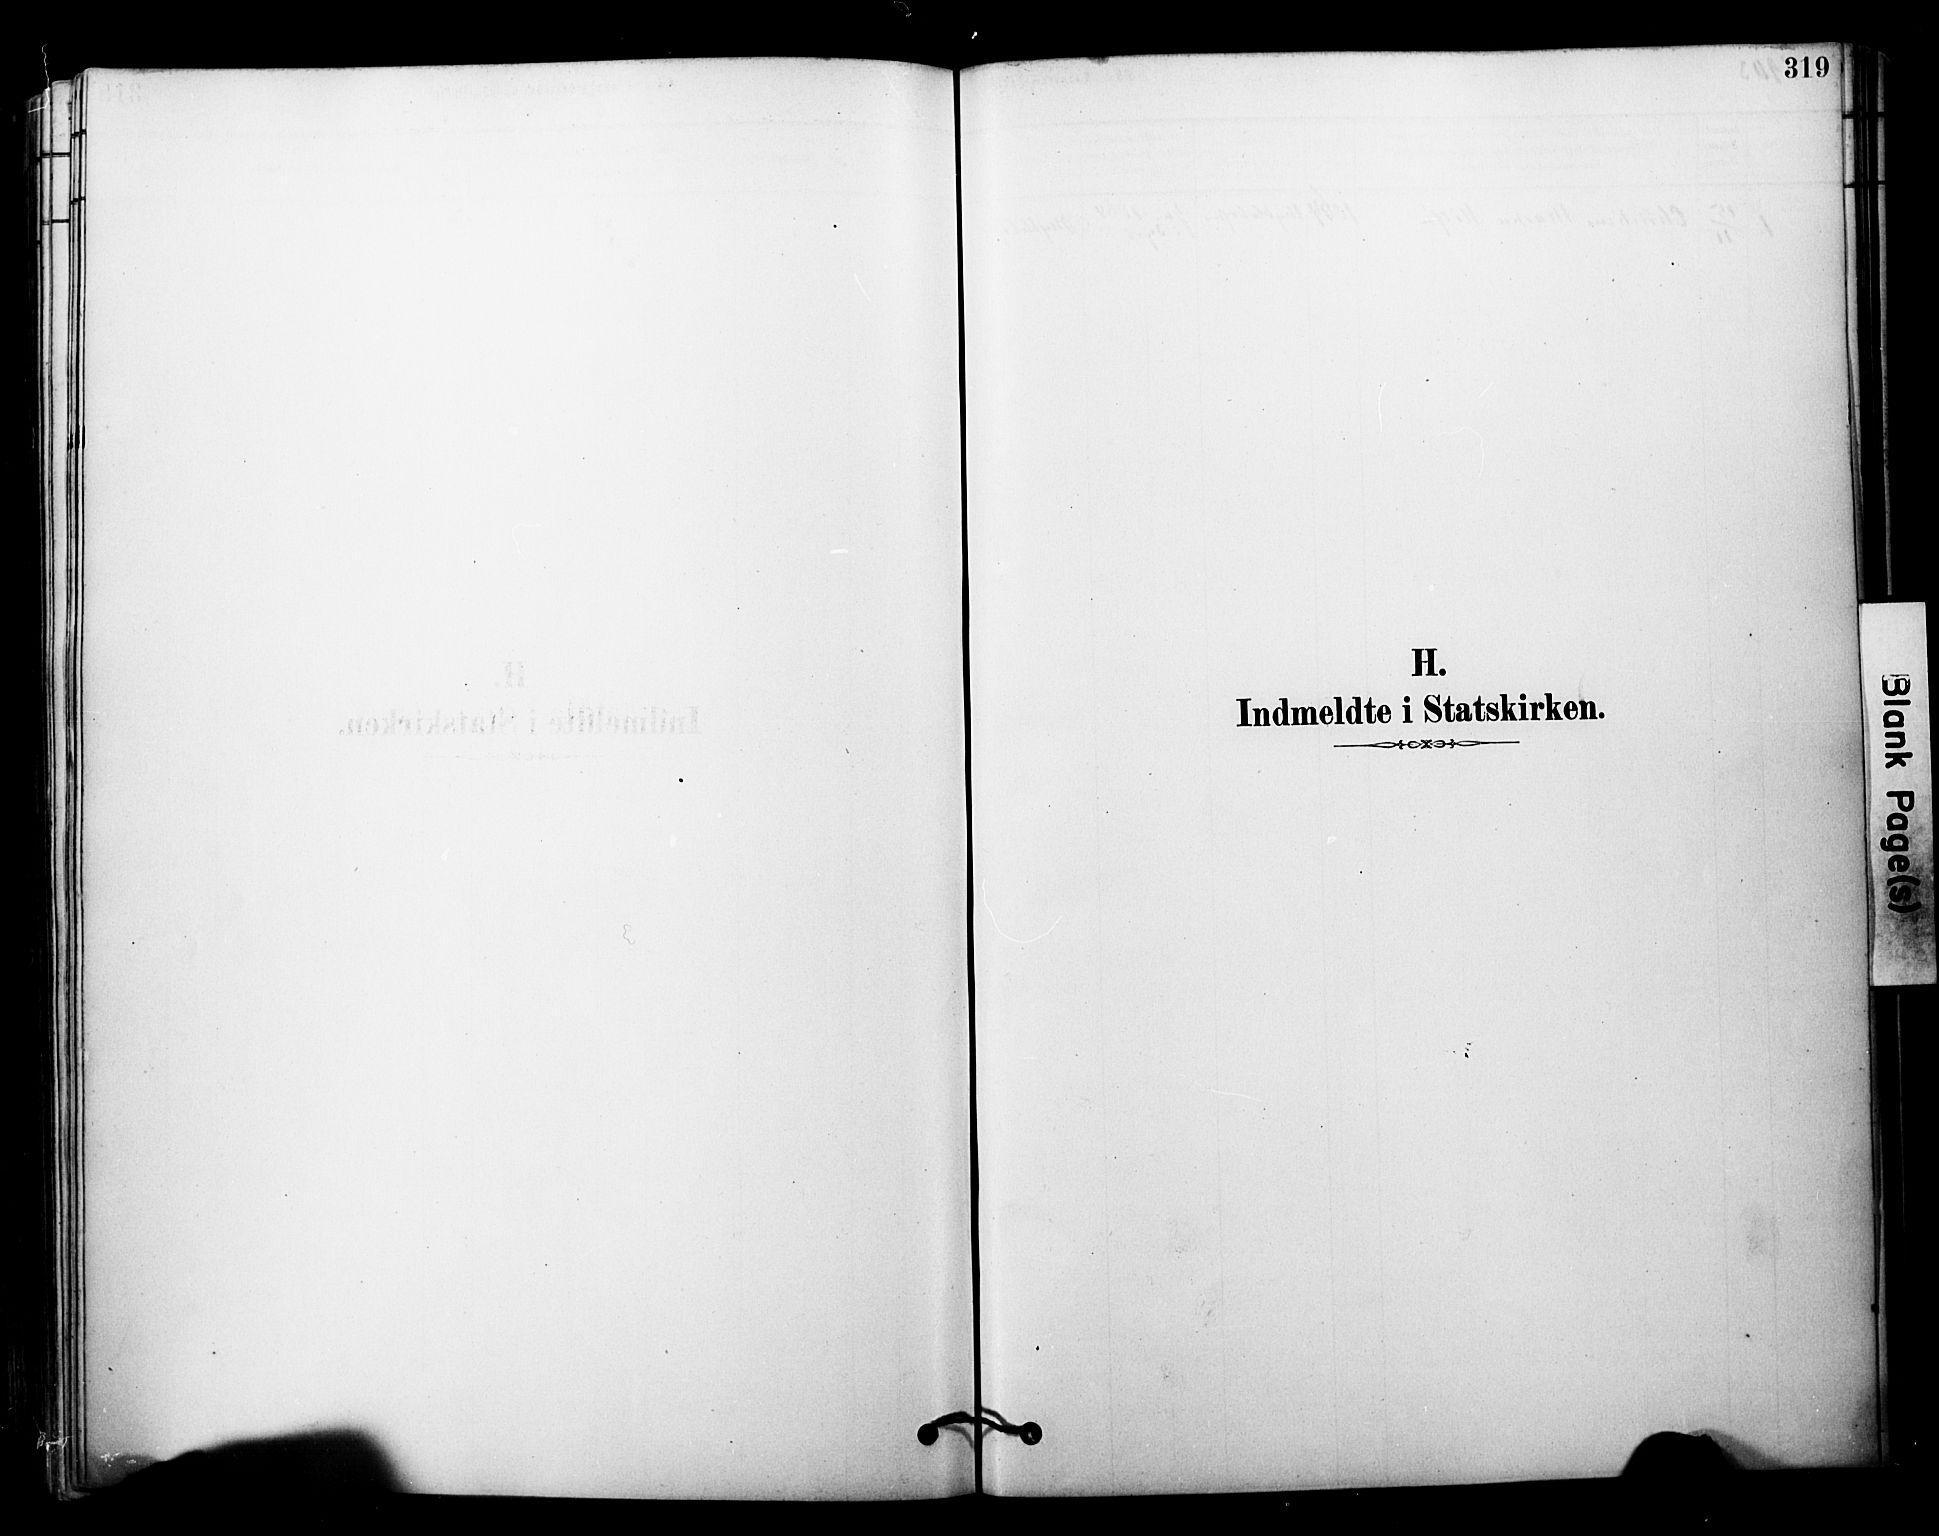 SATØ, Tranøy sokneprestkontor, I/Ia/Iaa/L0011kirke: Ministerialbok nr. 11, 1878-1904, s. 319